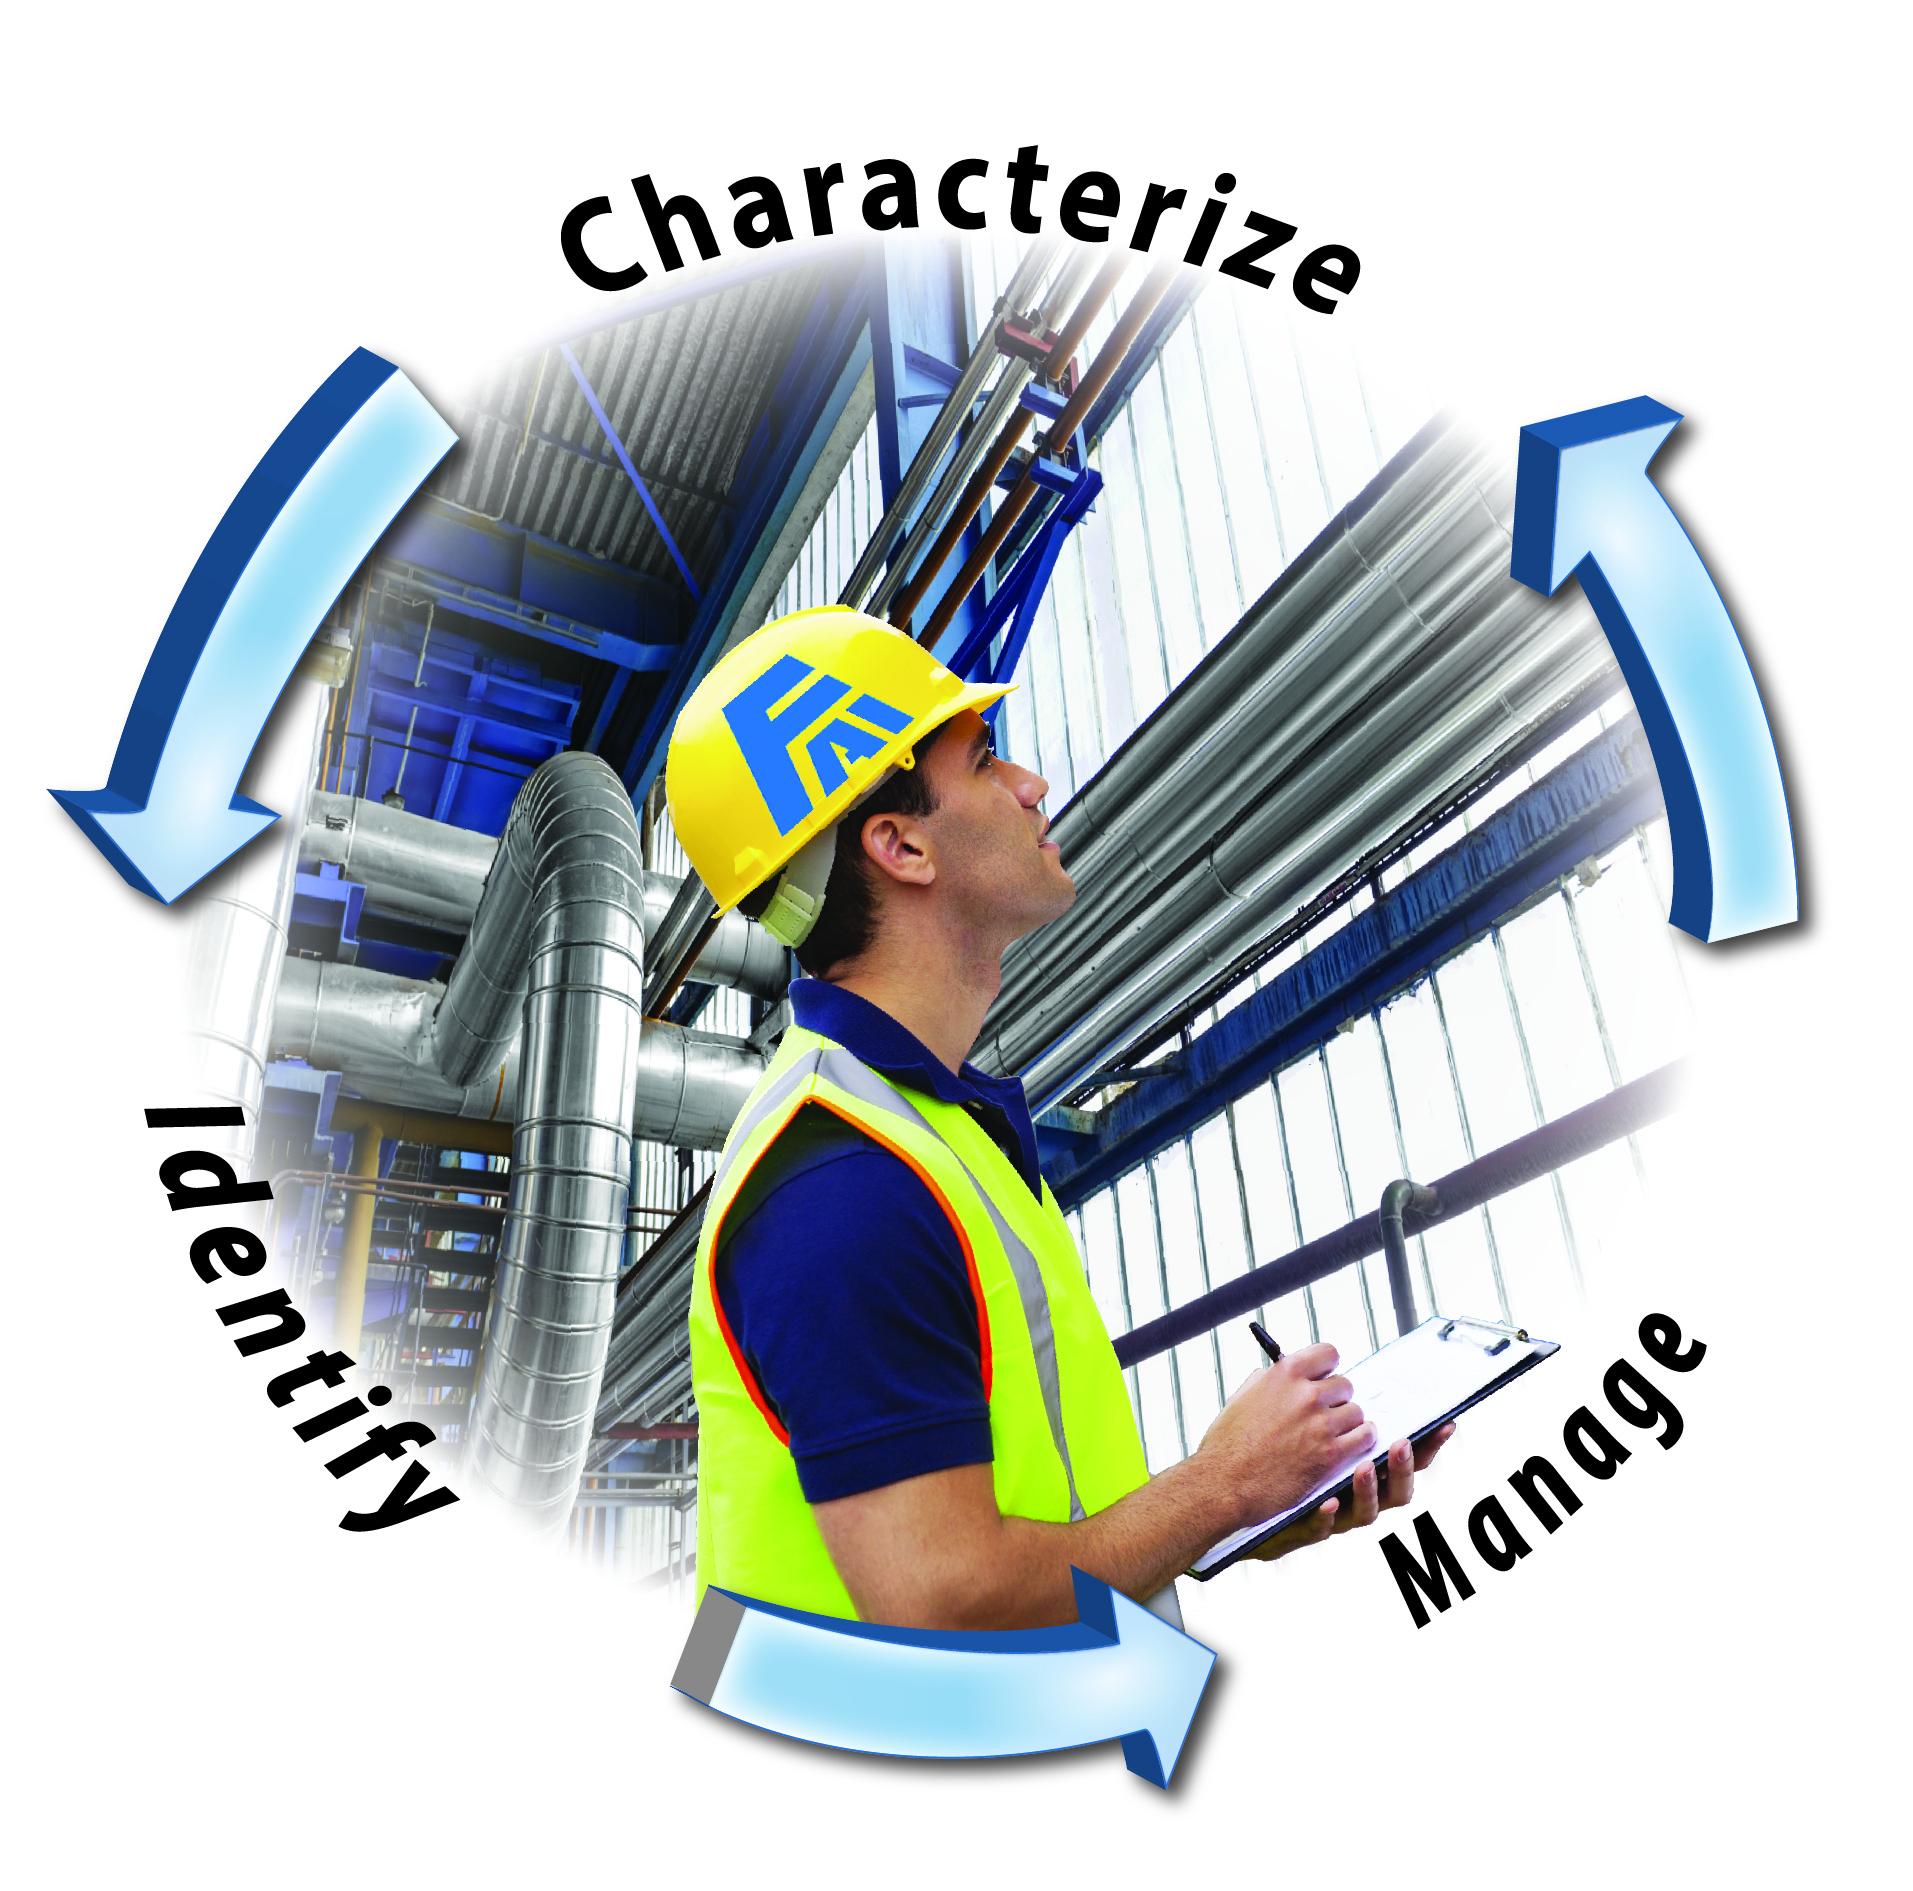 DHA-Facilitation-ID-Characterize-Manage